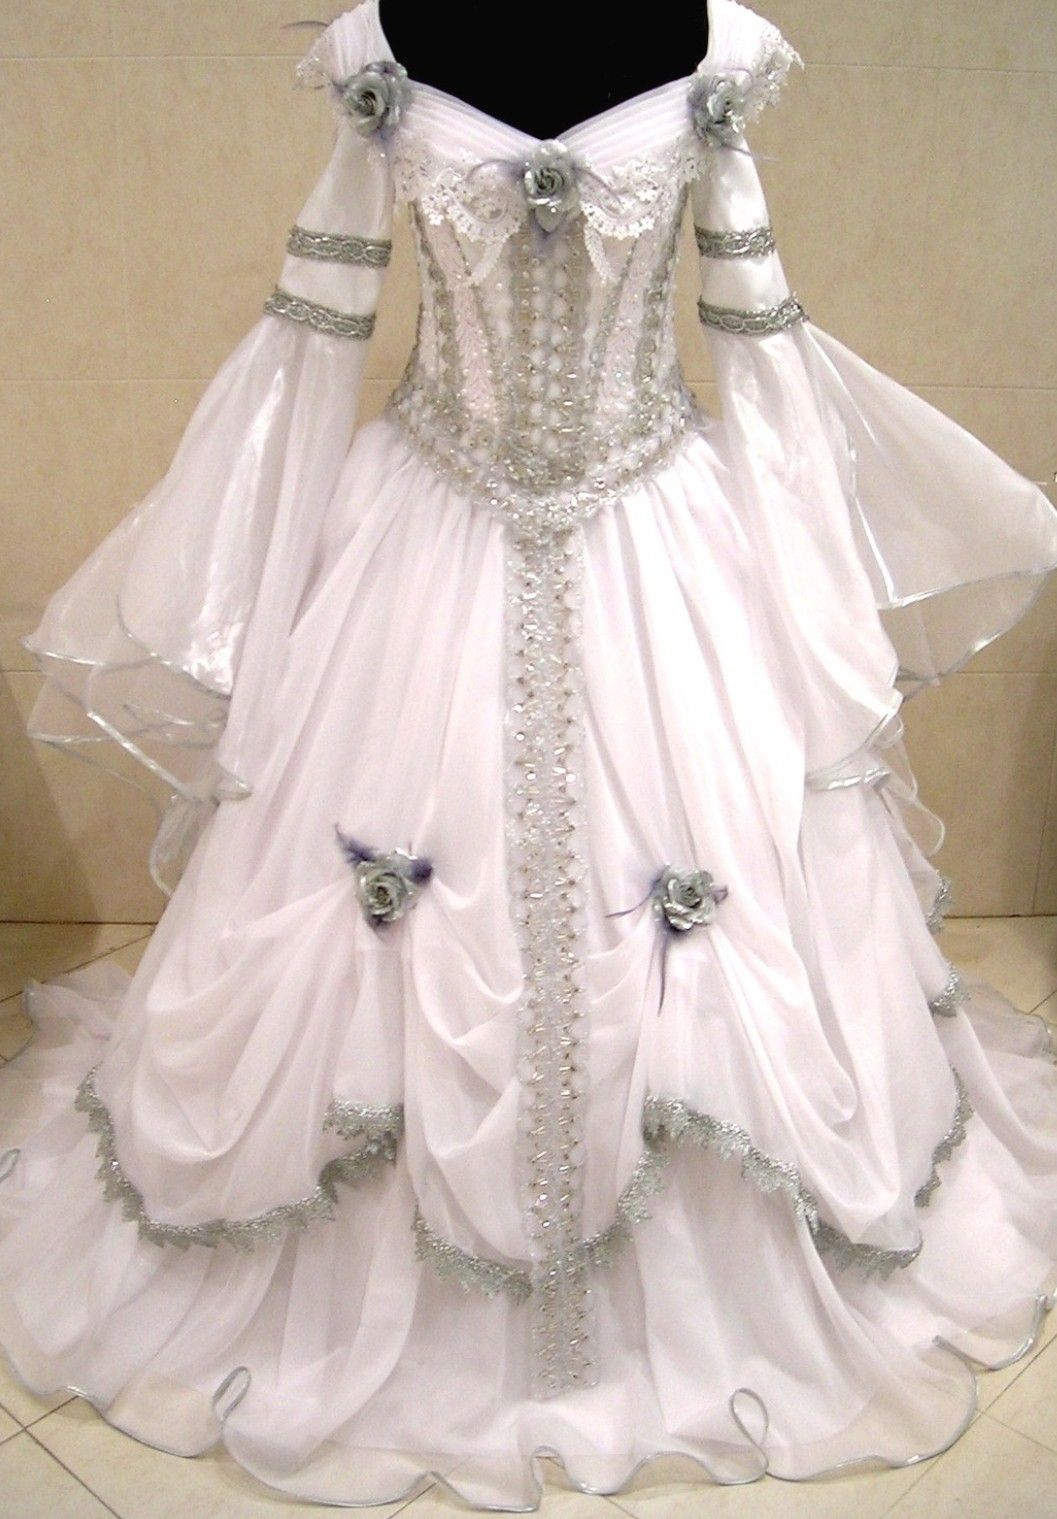 Celtic wedding dress  Medieval Dress  Bridal gown patterns  Pinterest  Medieval dress